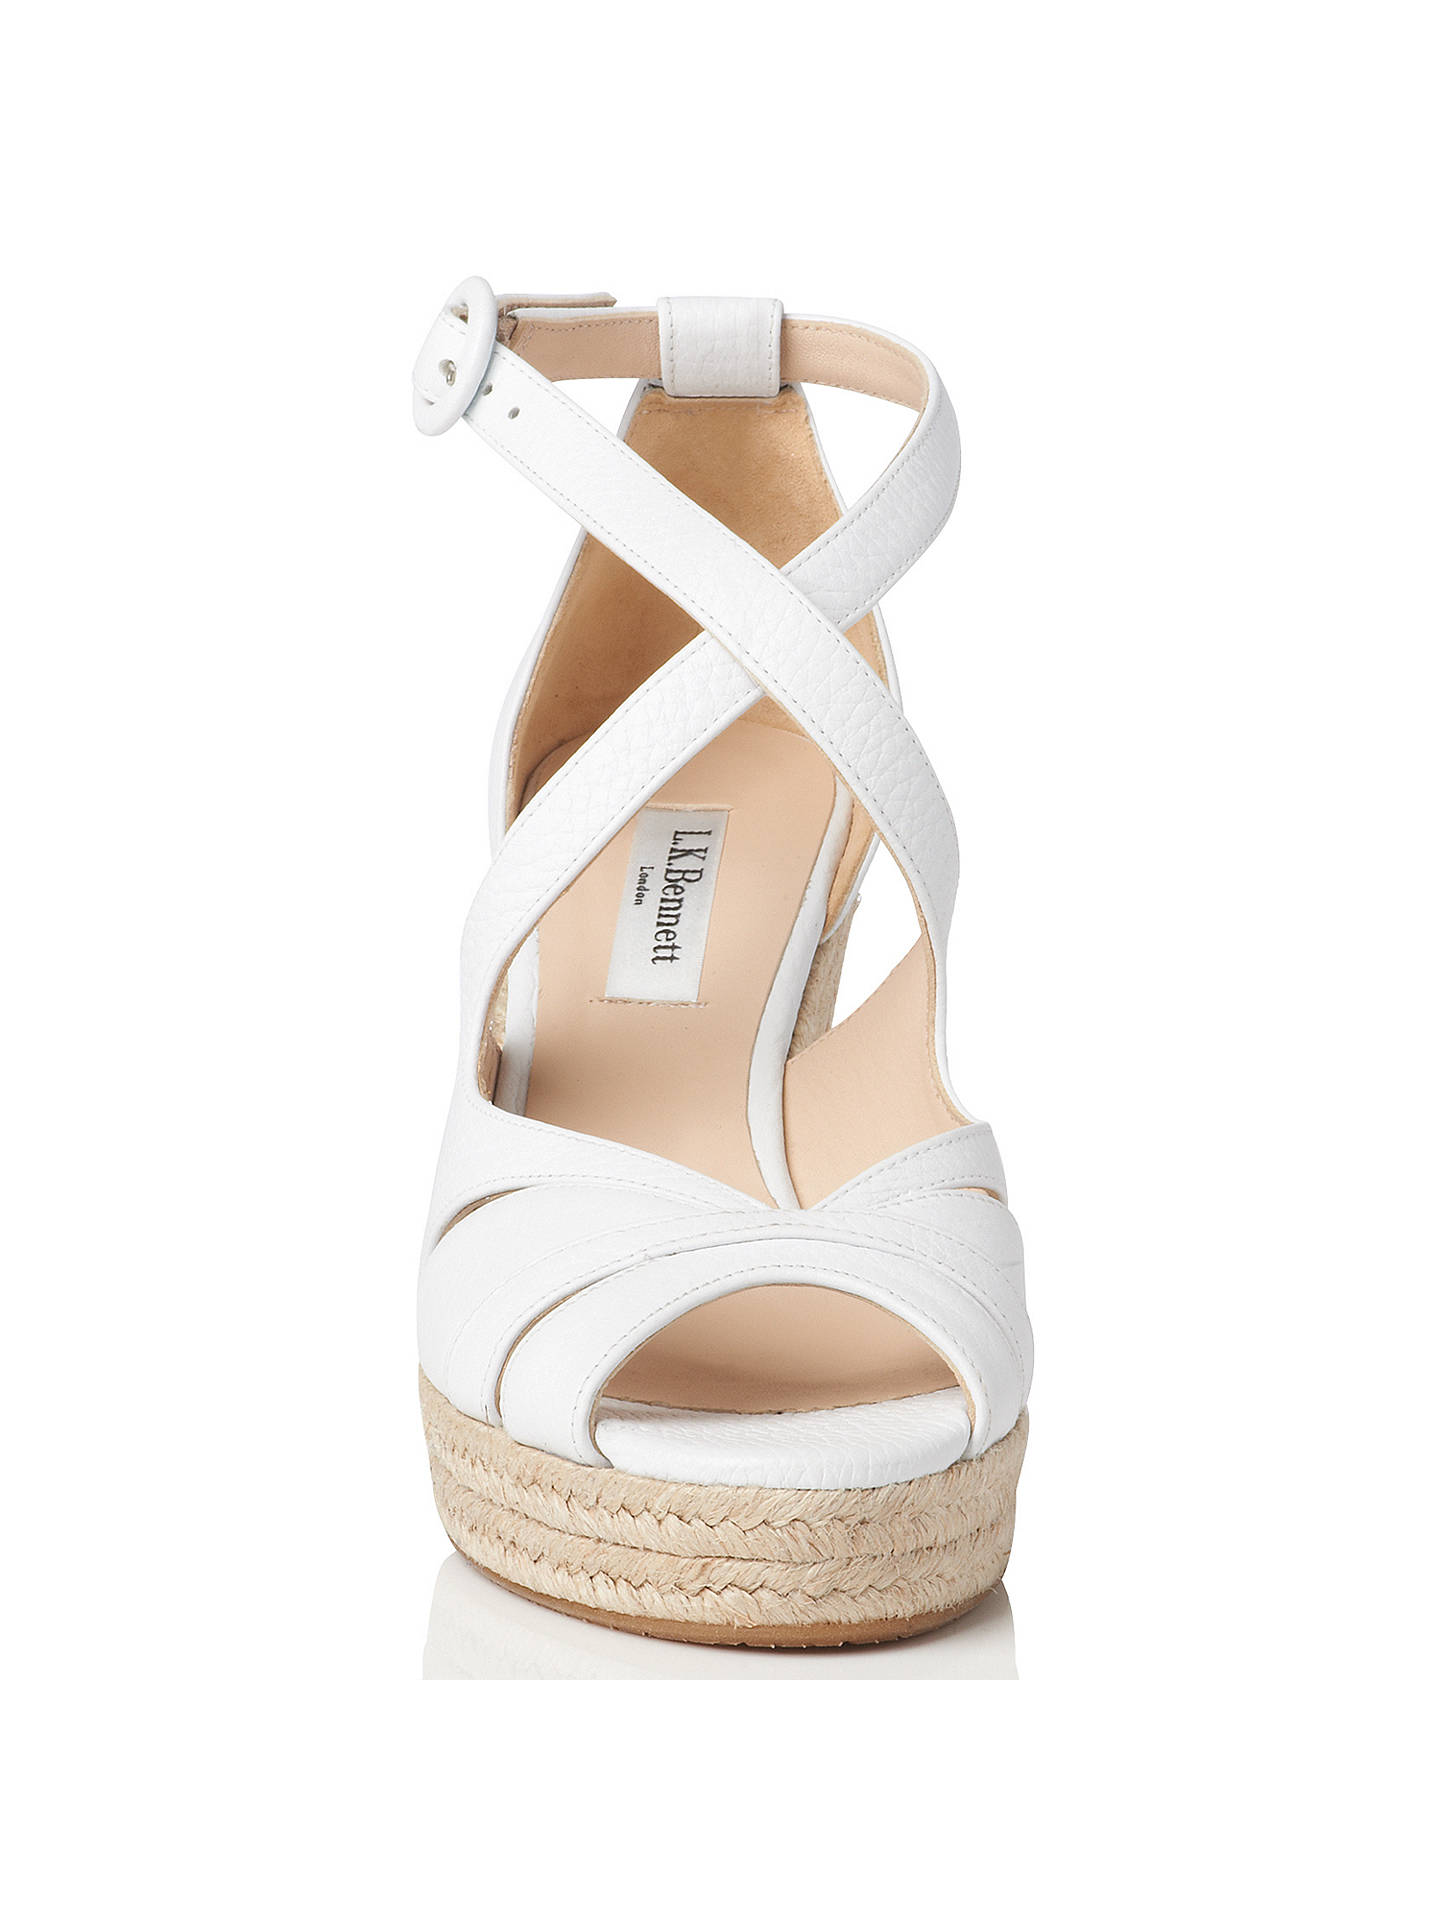 fd69cee358e8 L.K. Bennett Maggie Espadrille Wedge Heeled Sandals at John Lewis ...